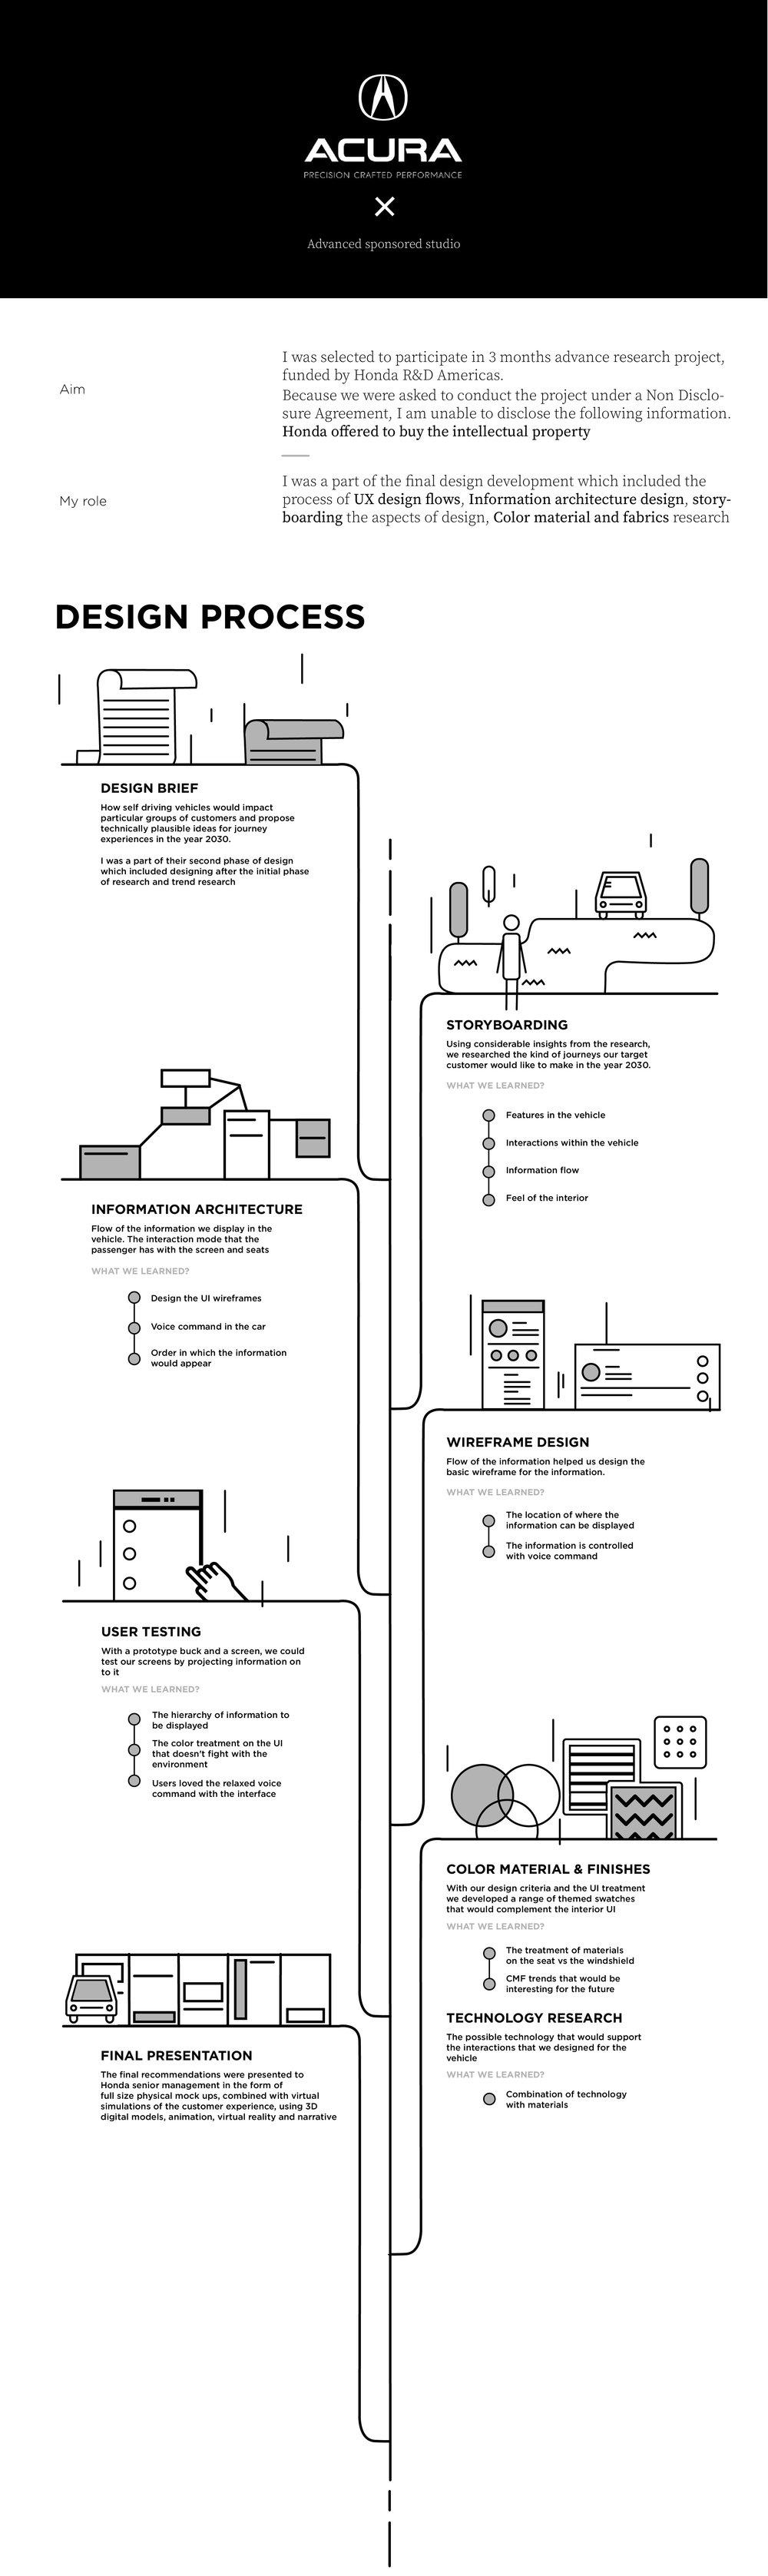 Acura infographic-01.jpg